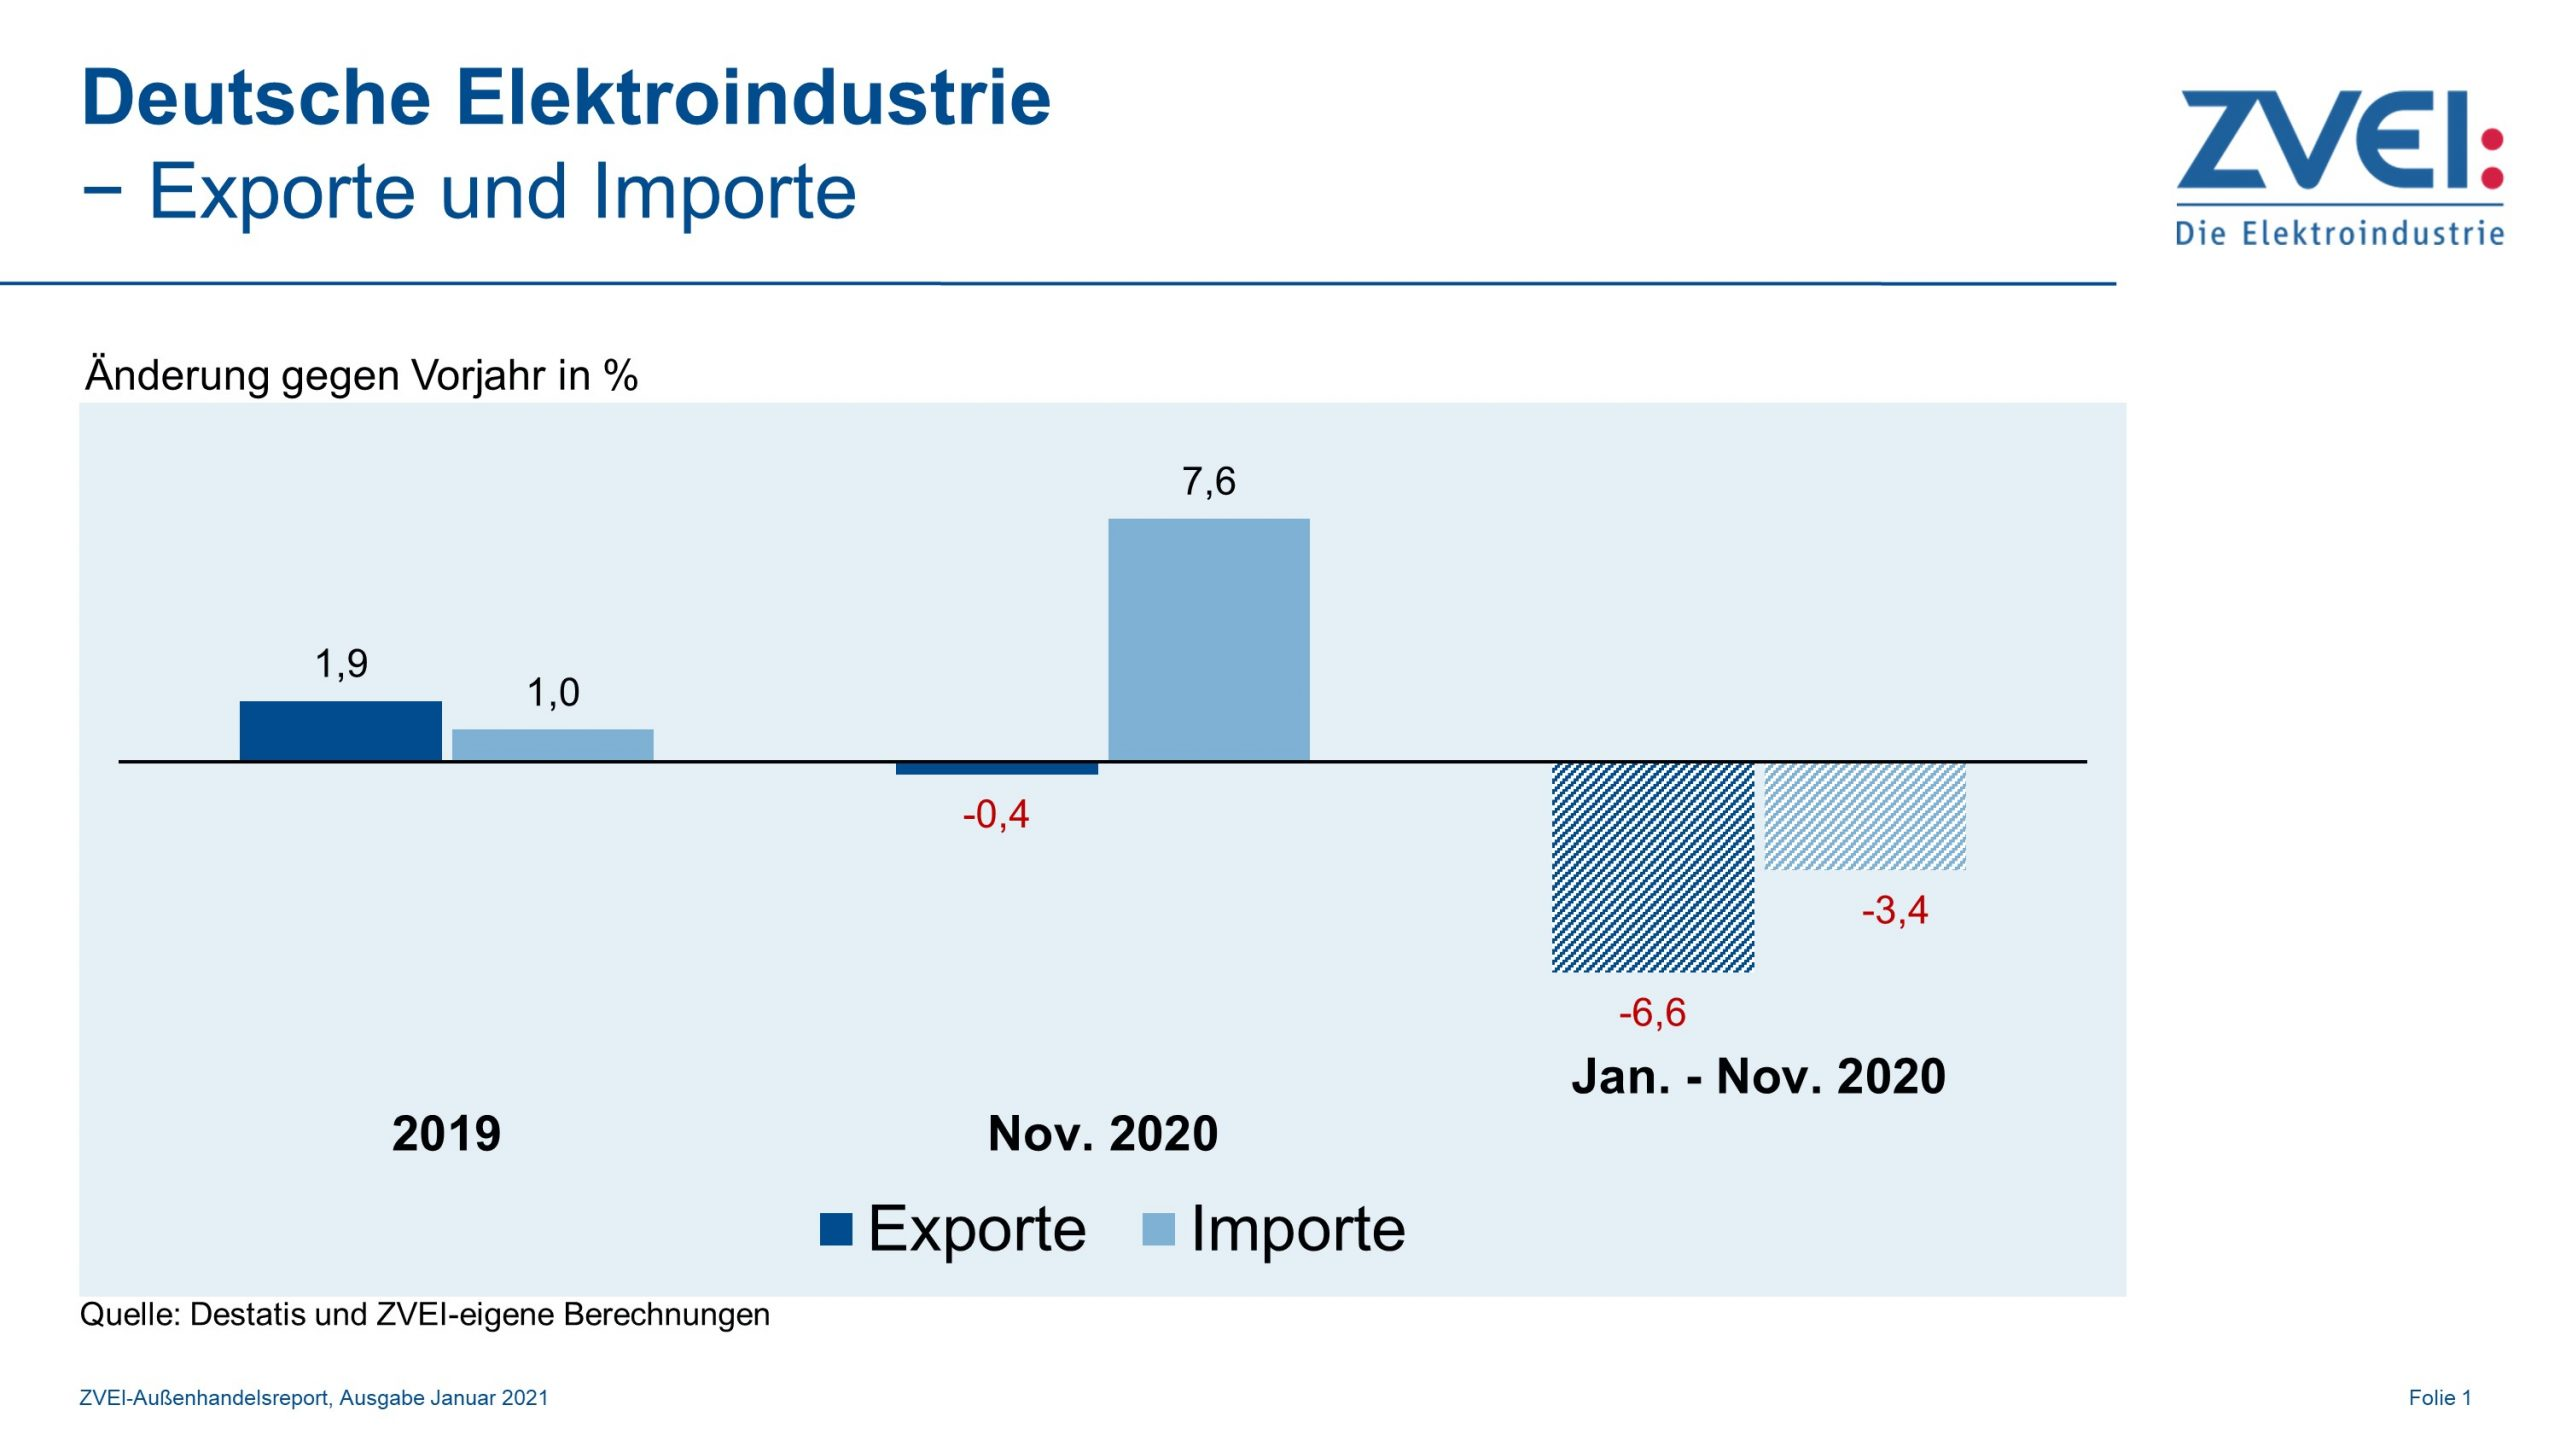 Elektroindustrie: Exporte noch leicht rückläufig